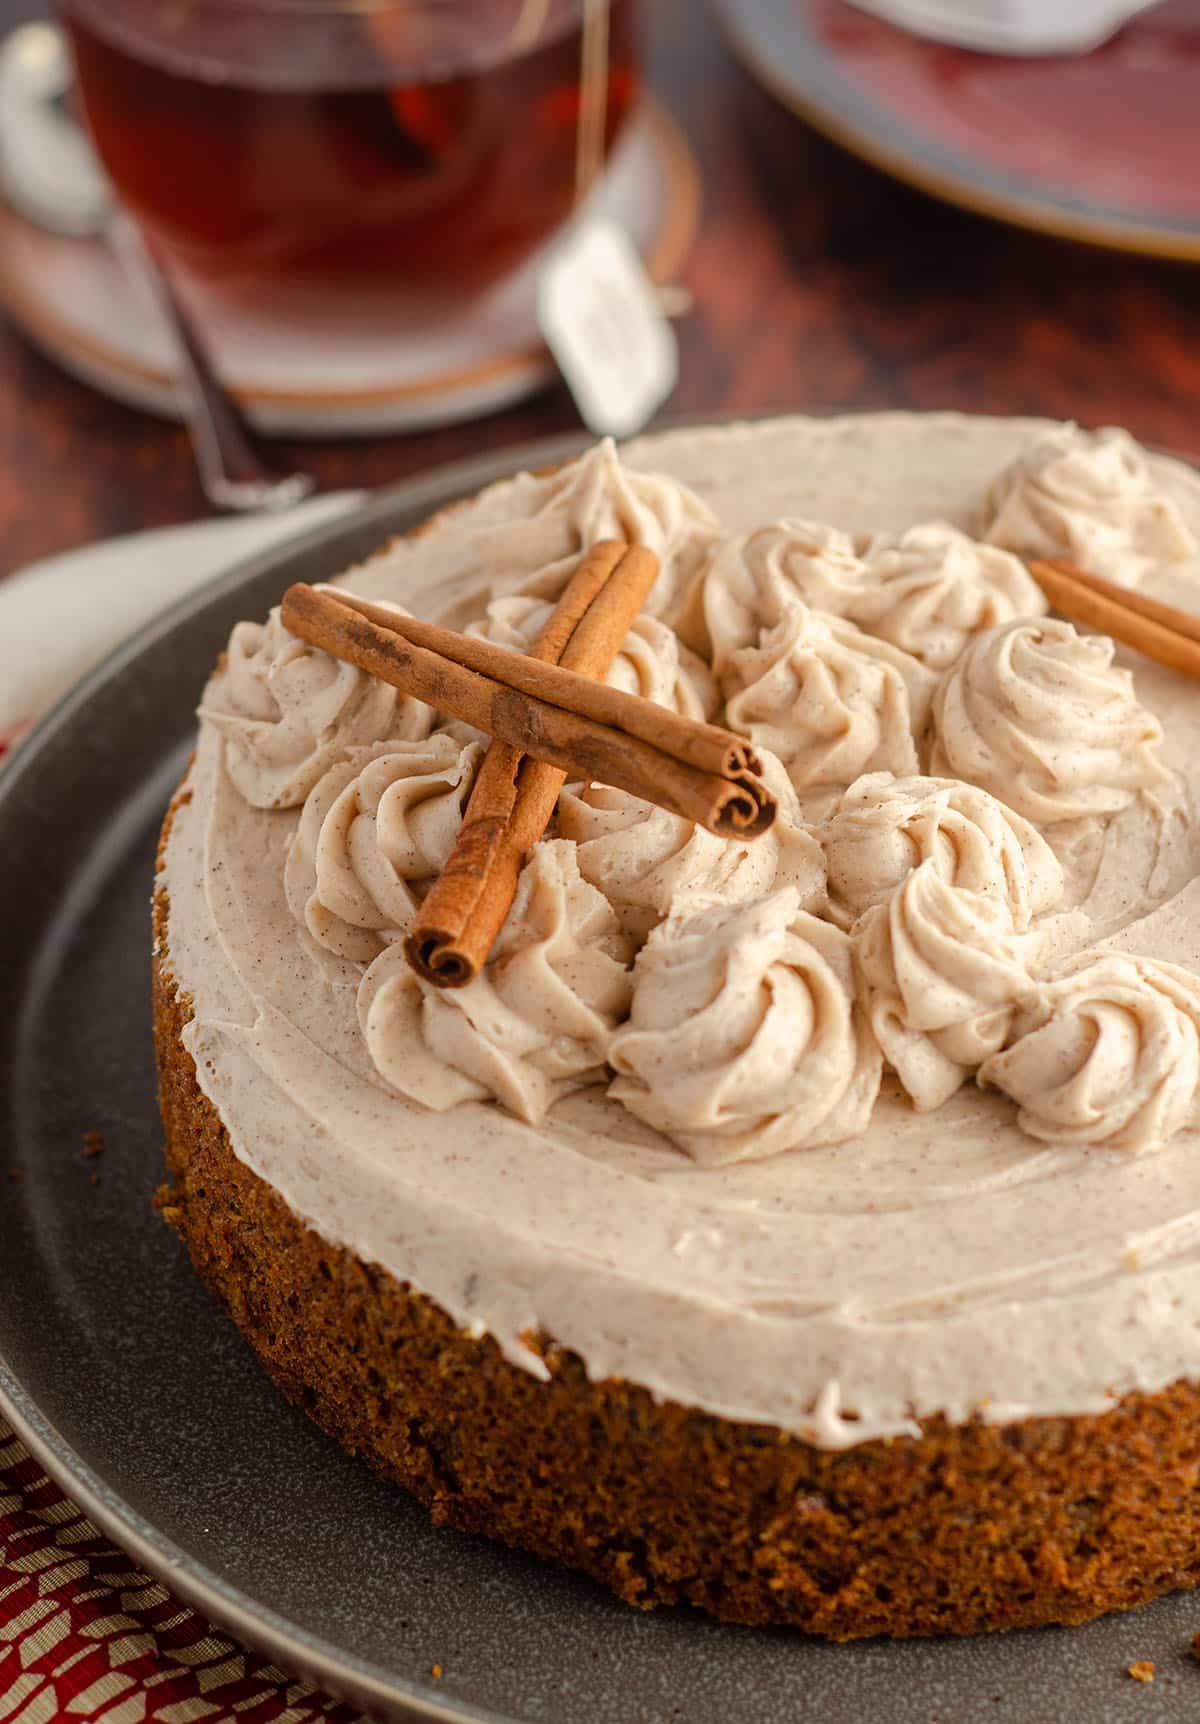 whole chai cake decorated with cinnamon sticks